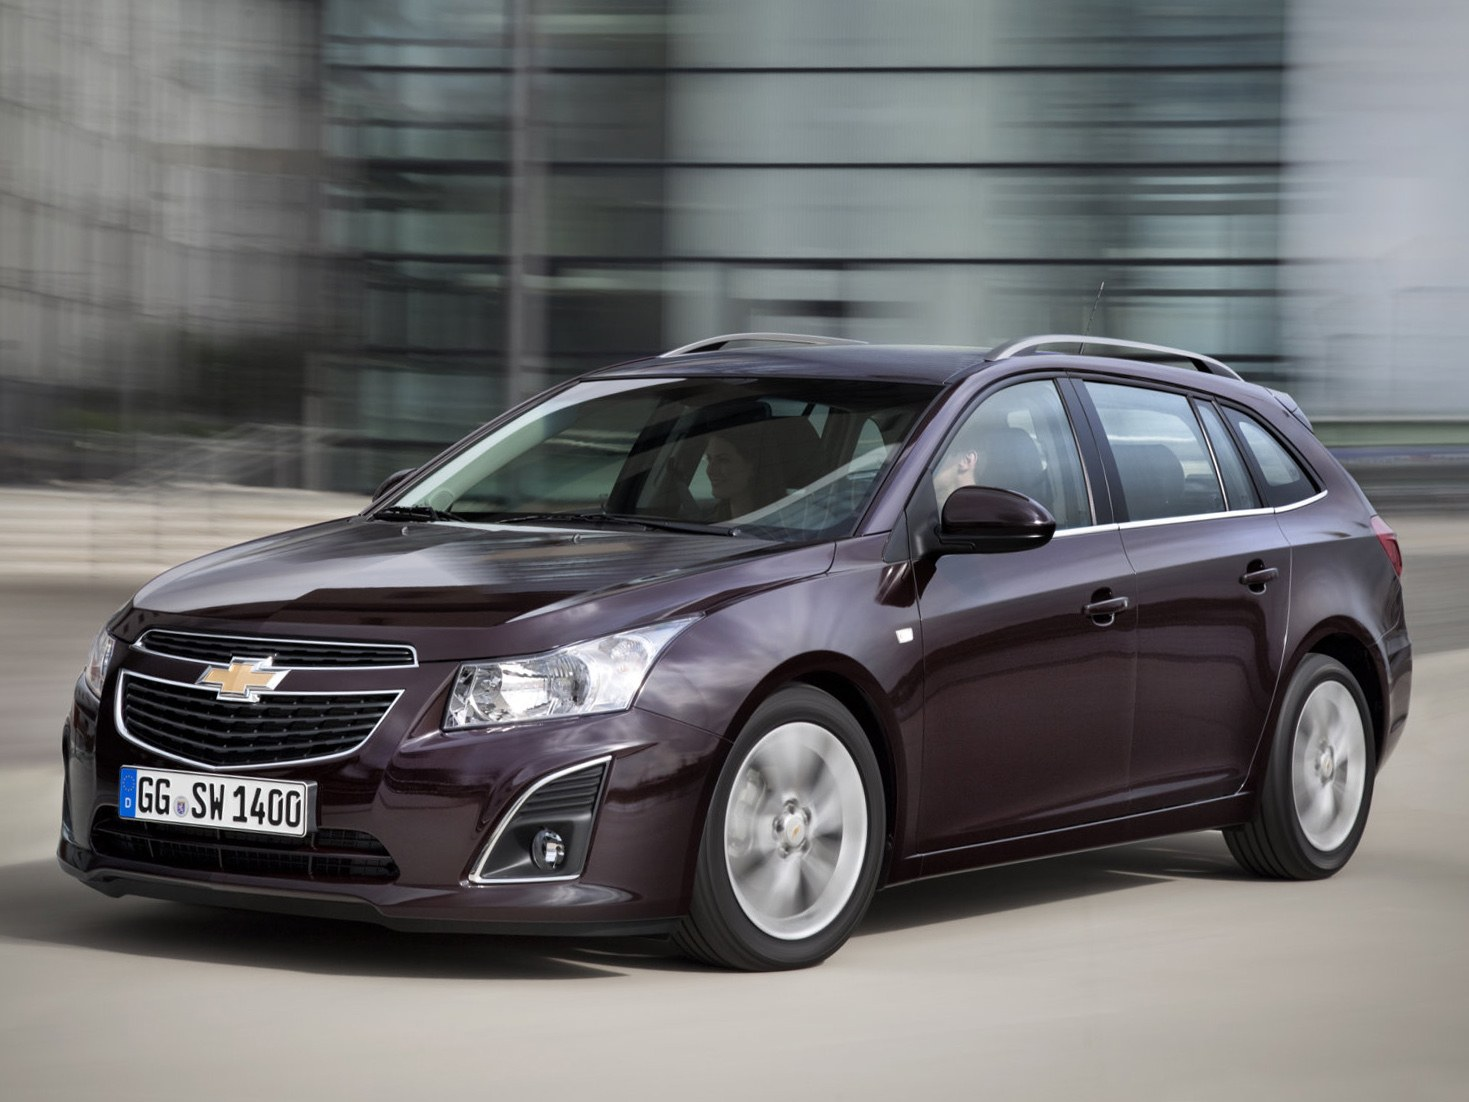 Chevrolet cruze station wagon цены известны.